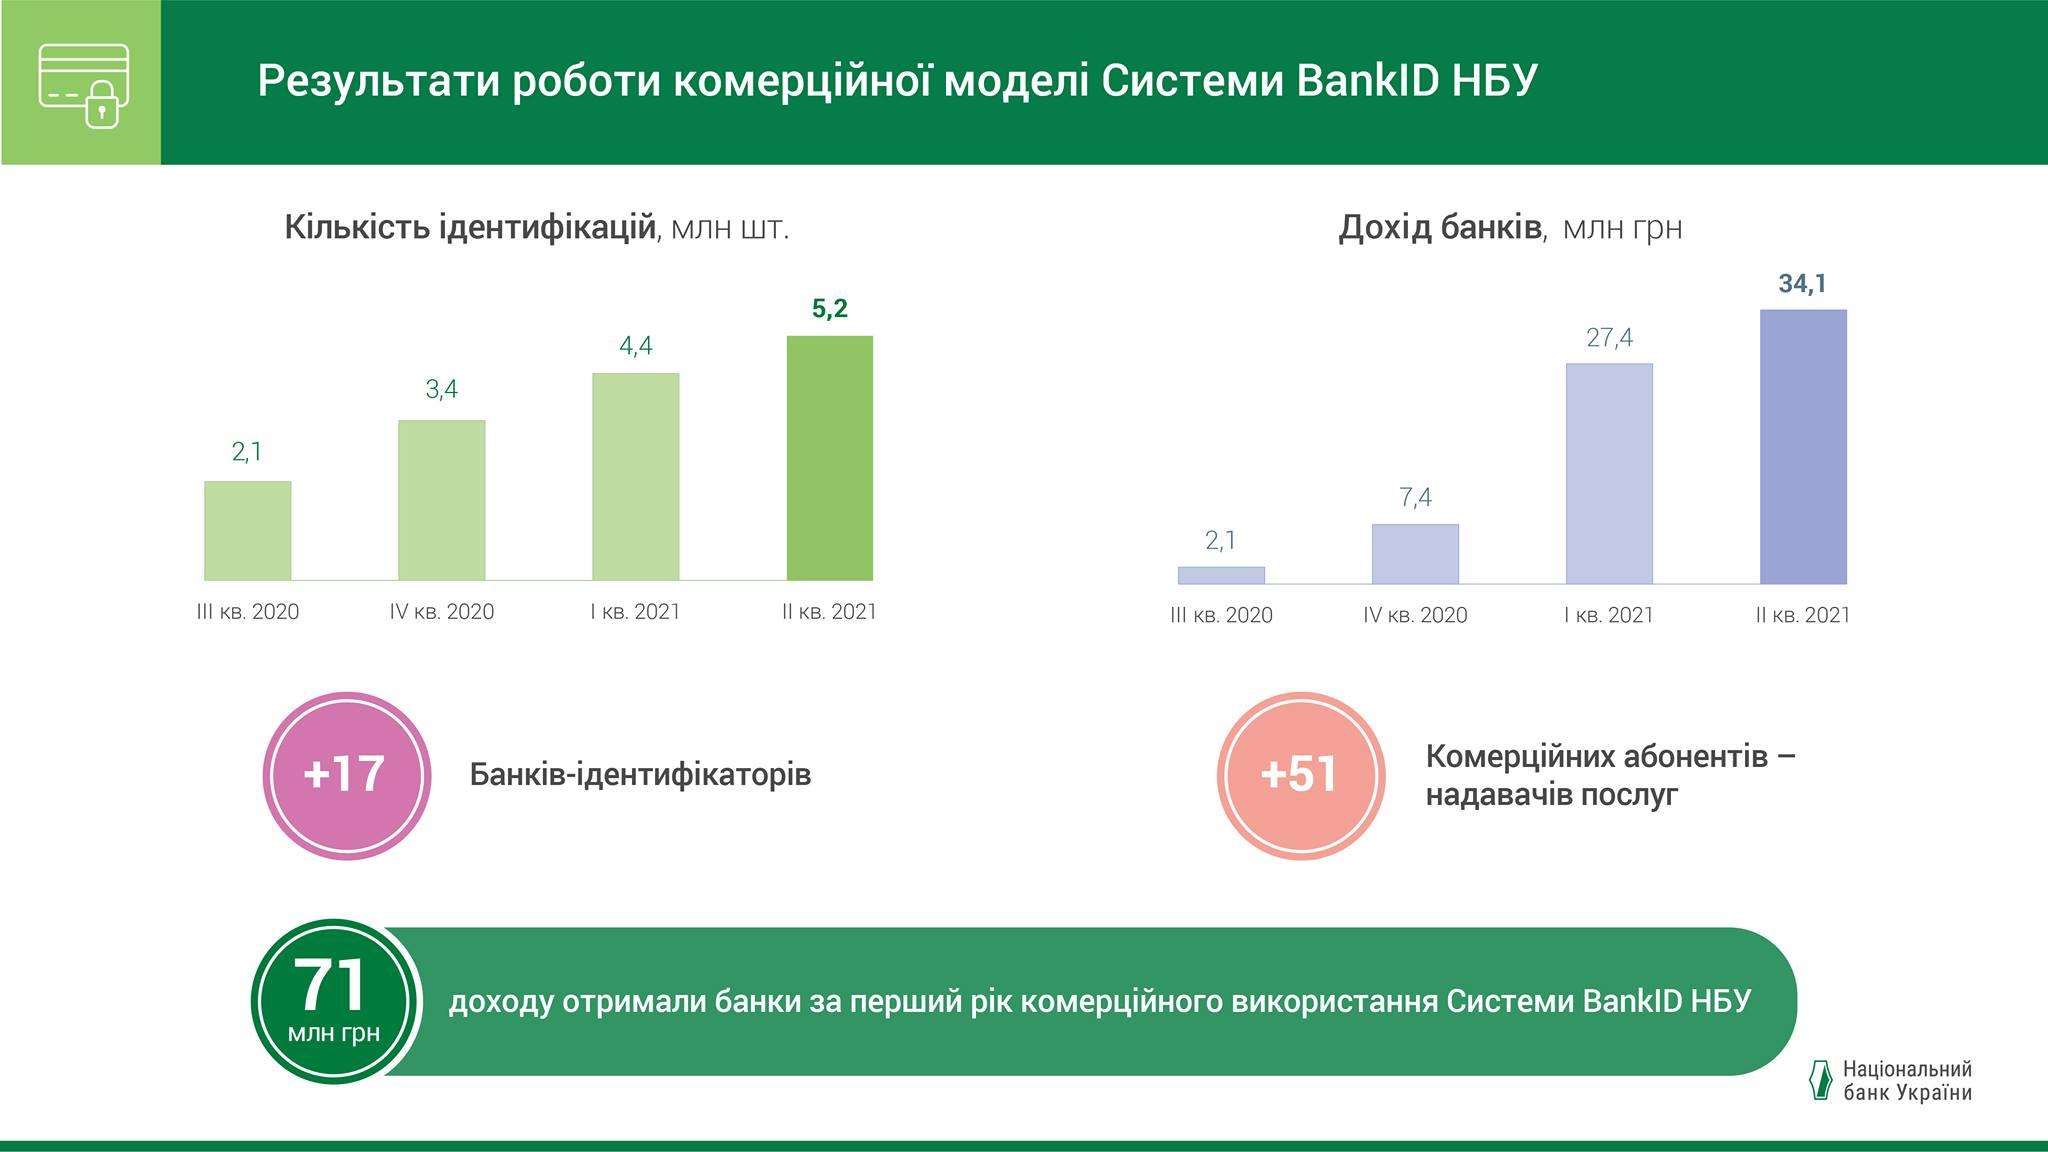 Система BankID за год принесла банкам 71 млн грн дохода